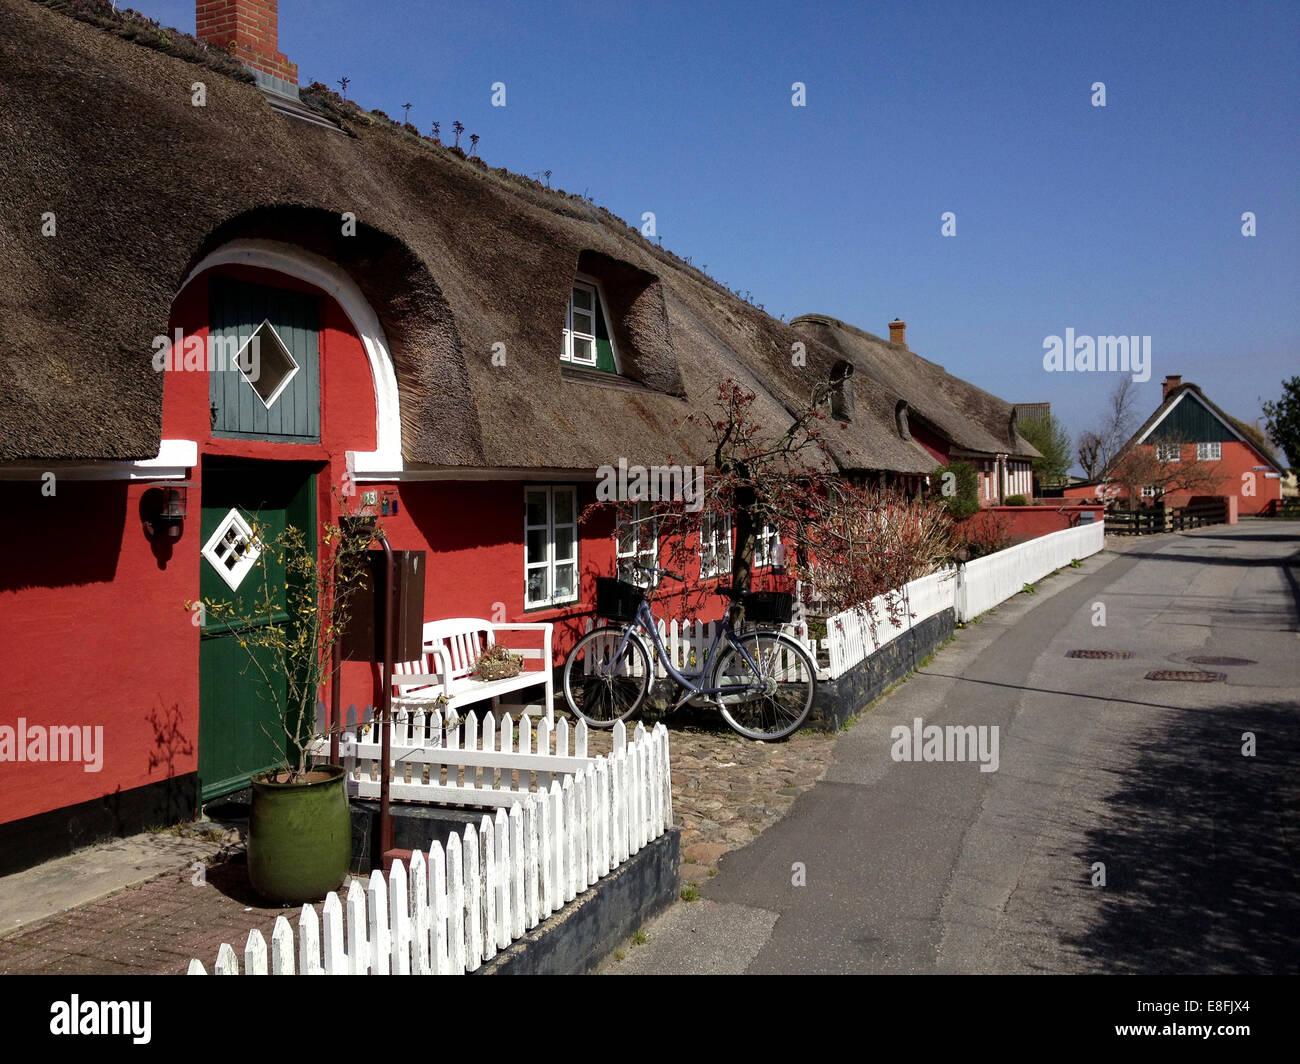 Cabañas de paja tradicionales, Fanoe, Dinamarca Imagen De Stock